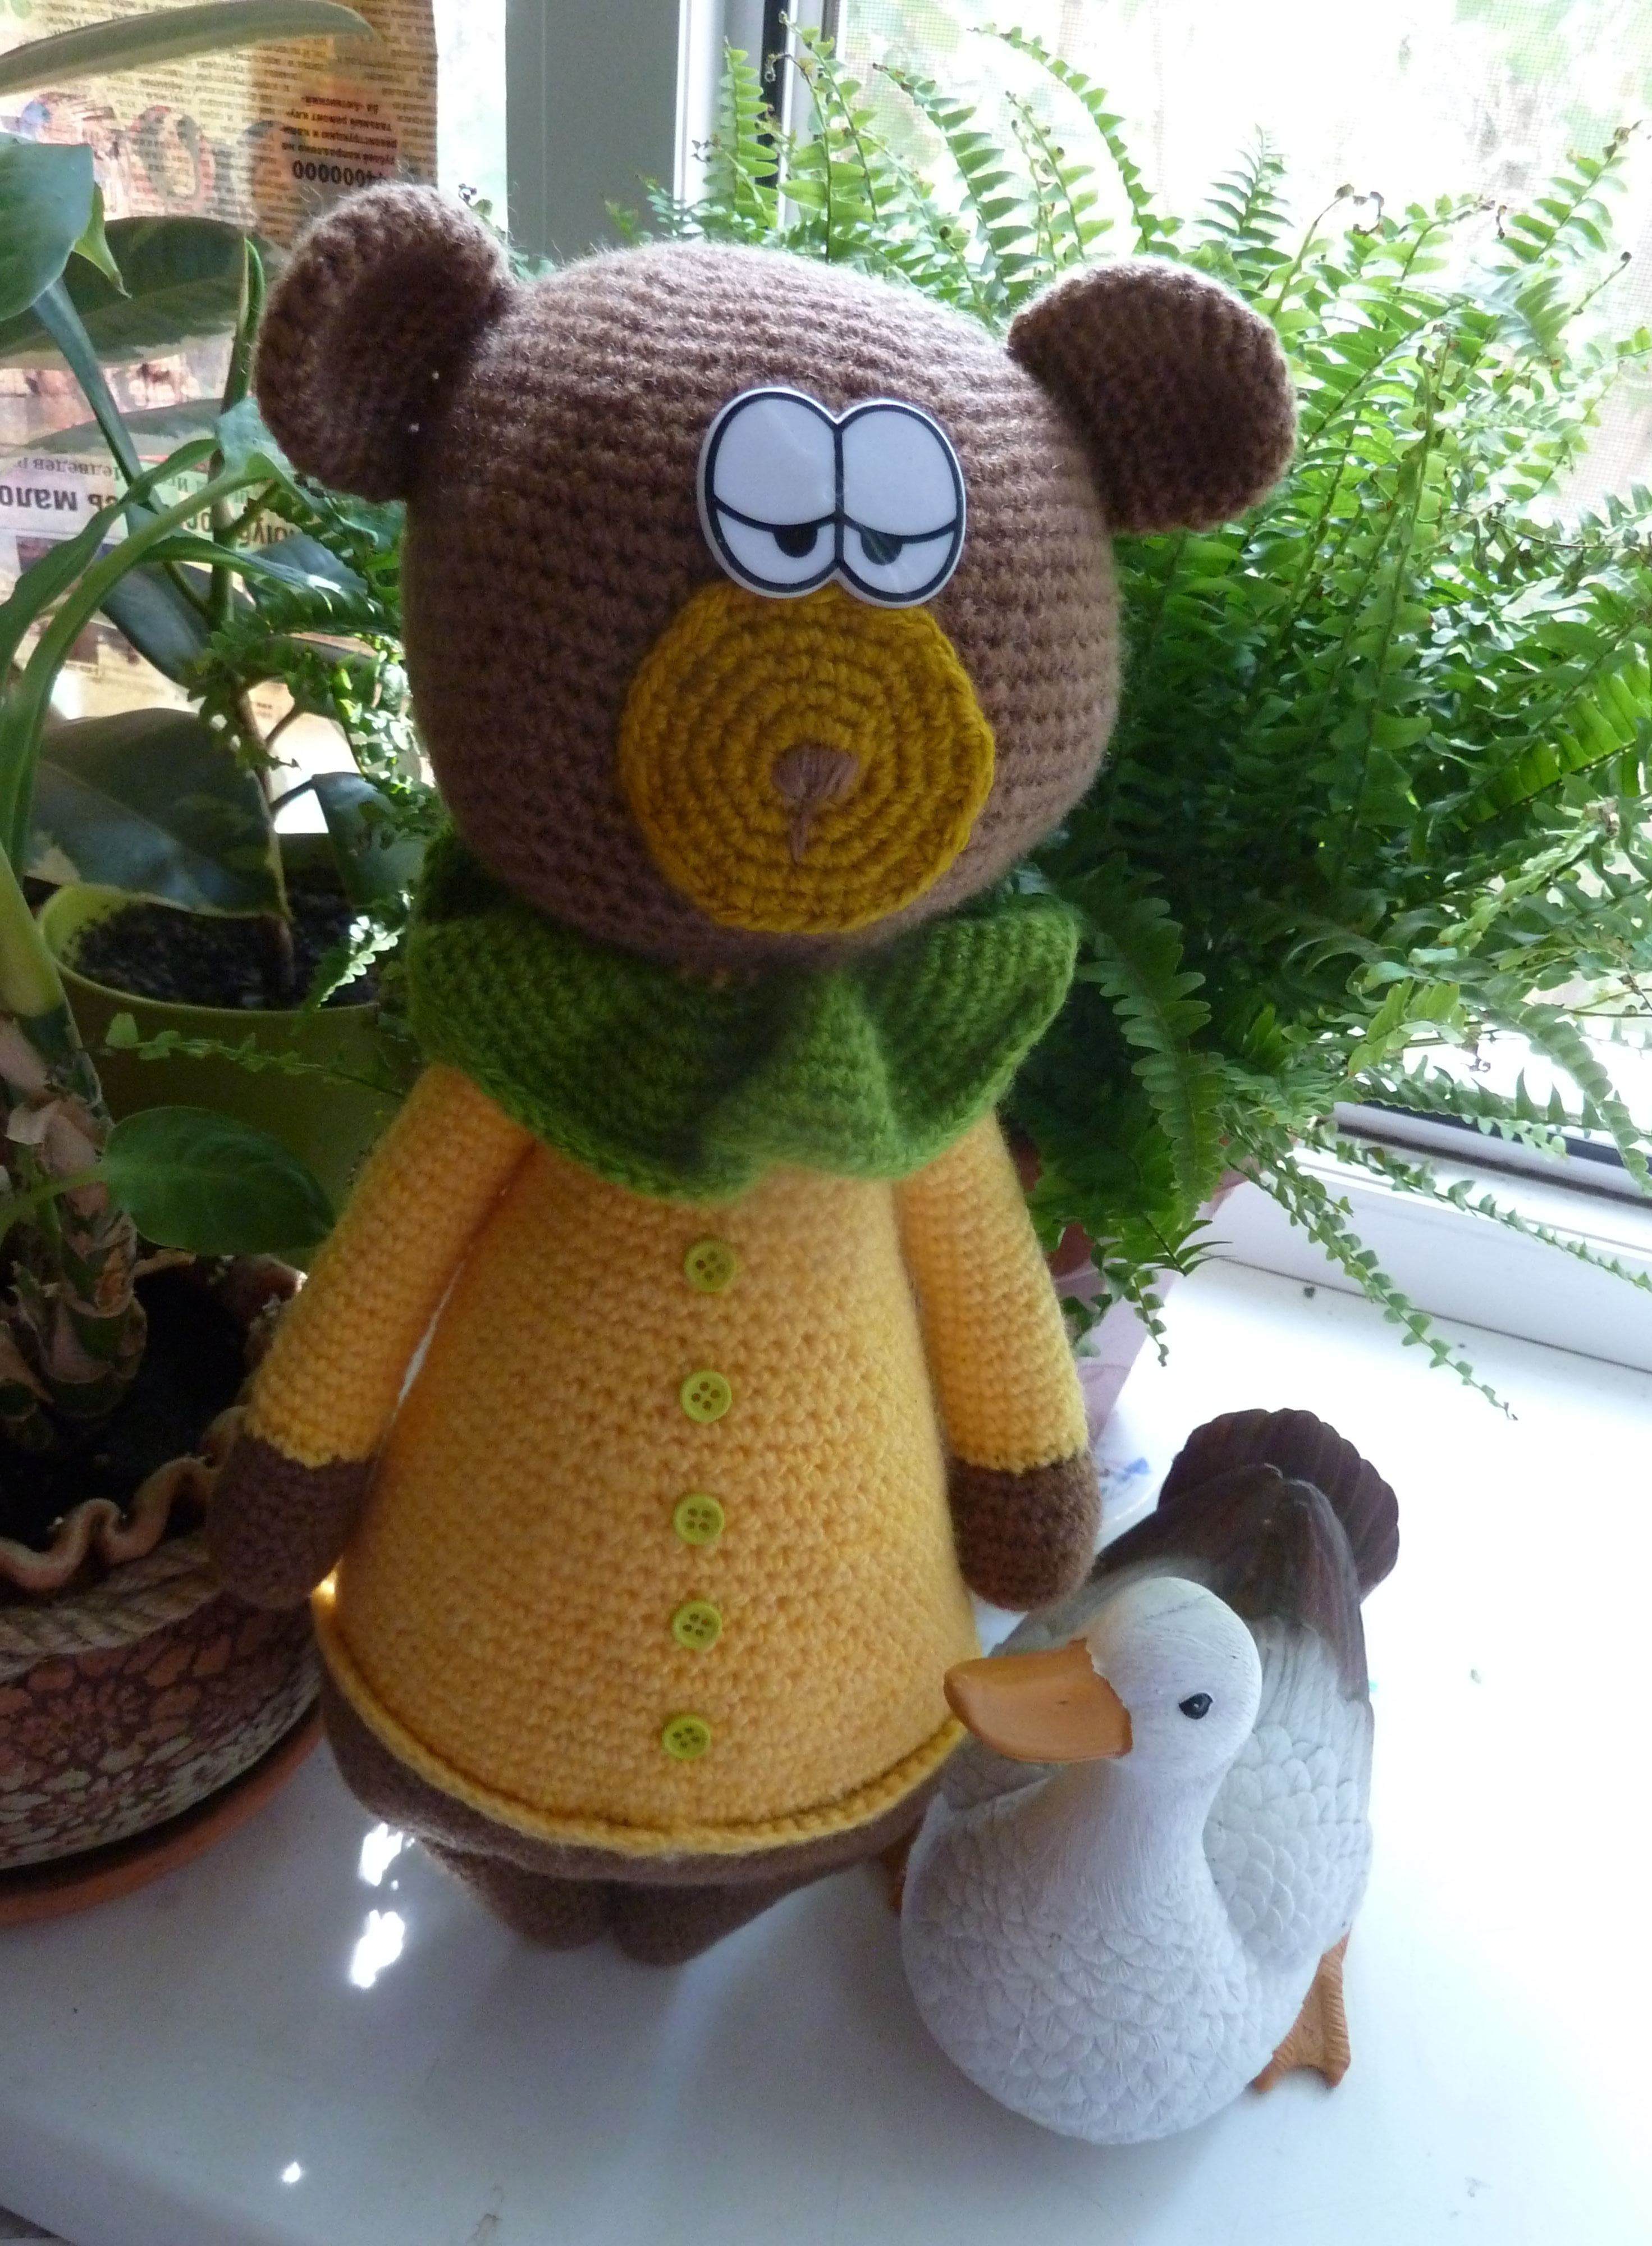 мишка медведь игрушки ручнаяработа дети